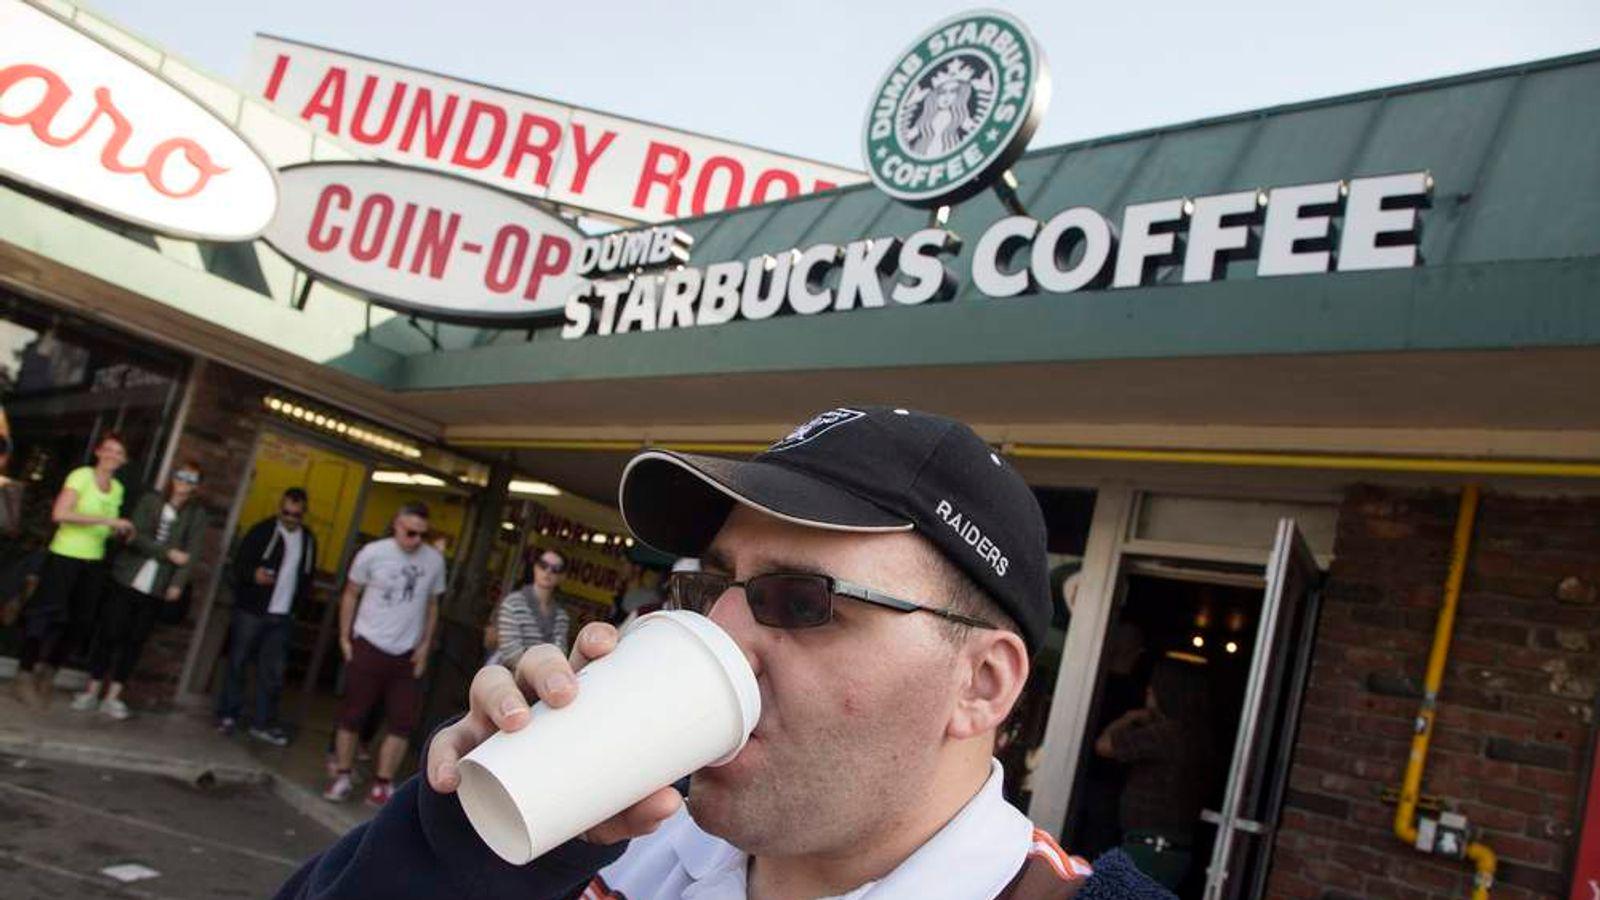 Dumb Starbucks' Shop Opened In Los Angeles | US News | Sky News